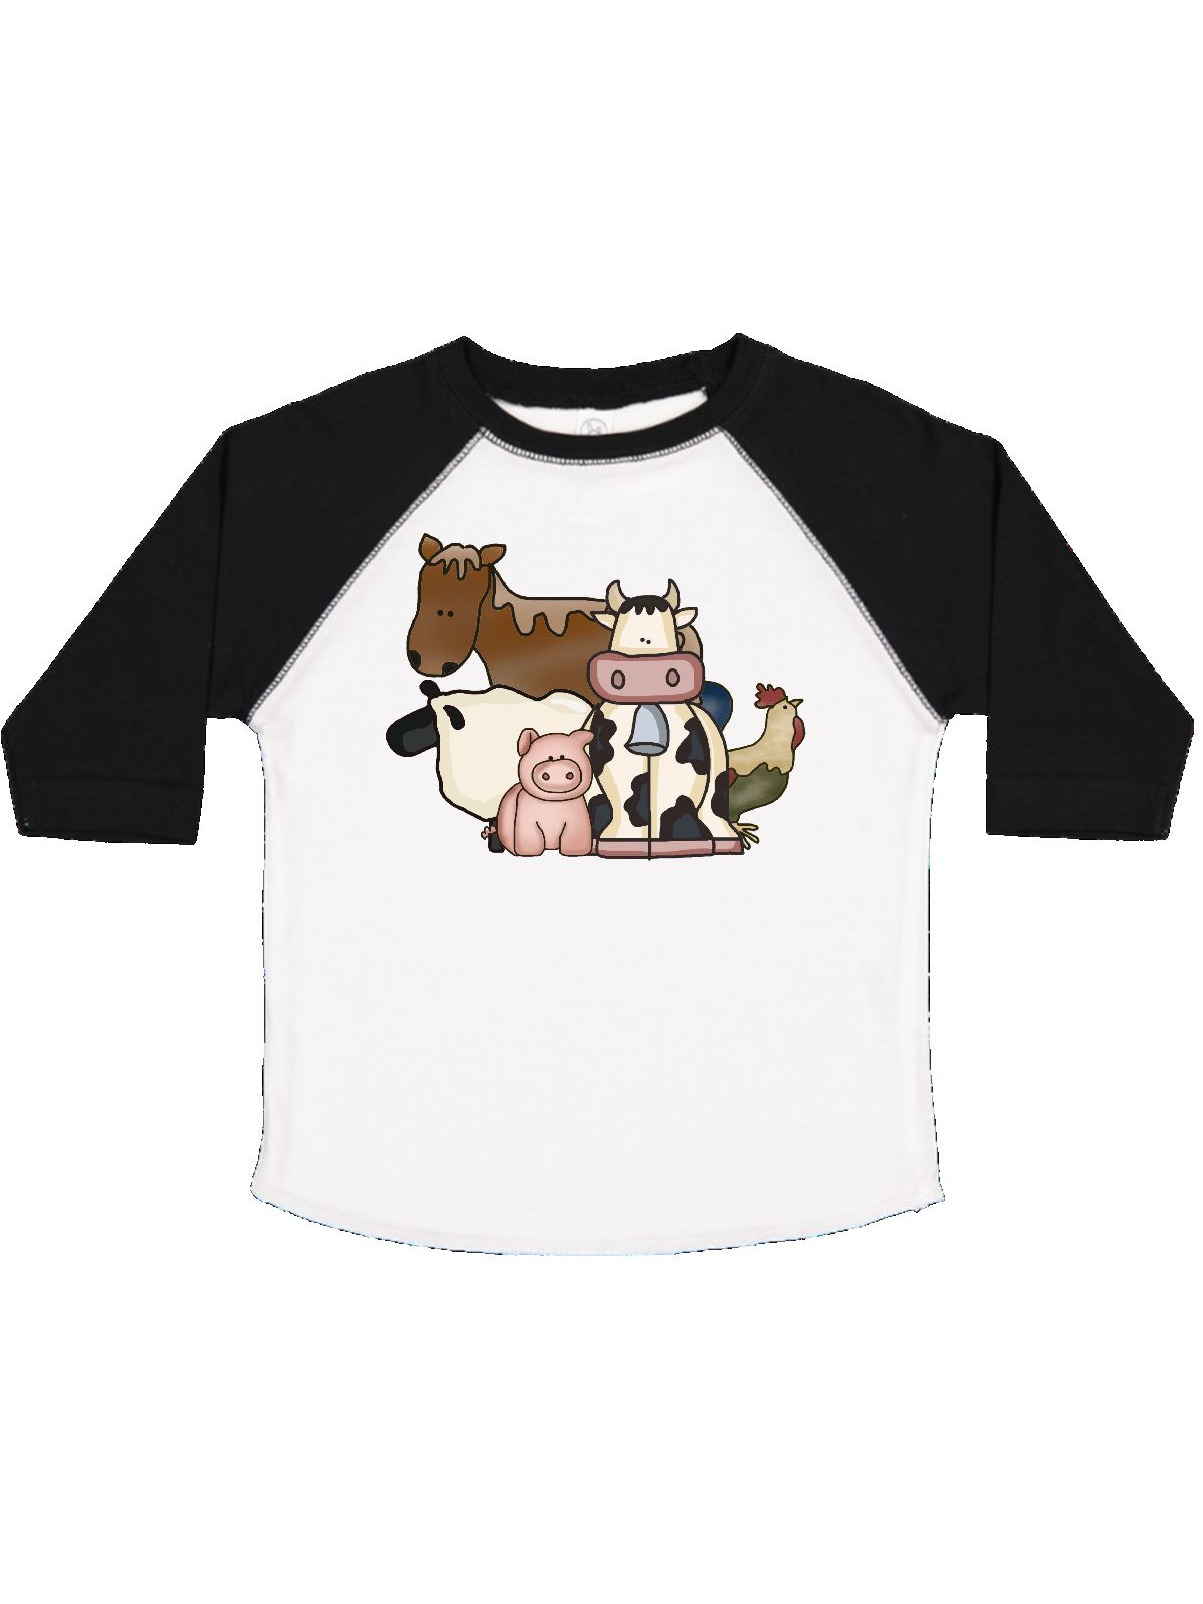 critters Toddler T-Shirt